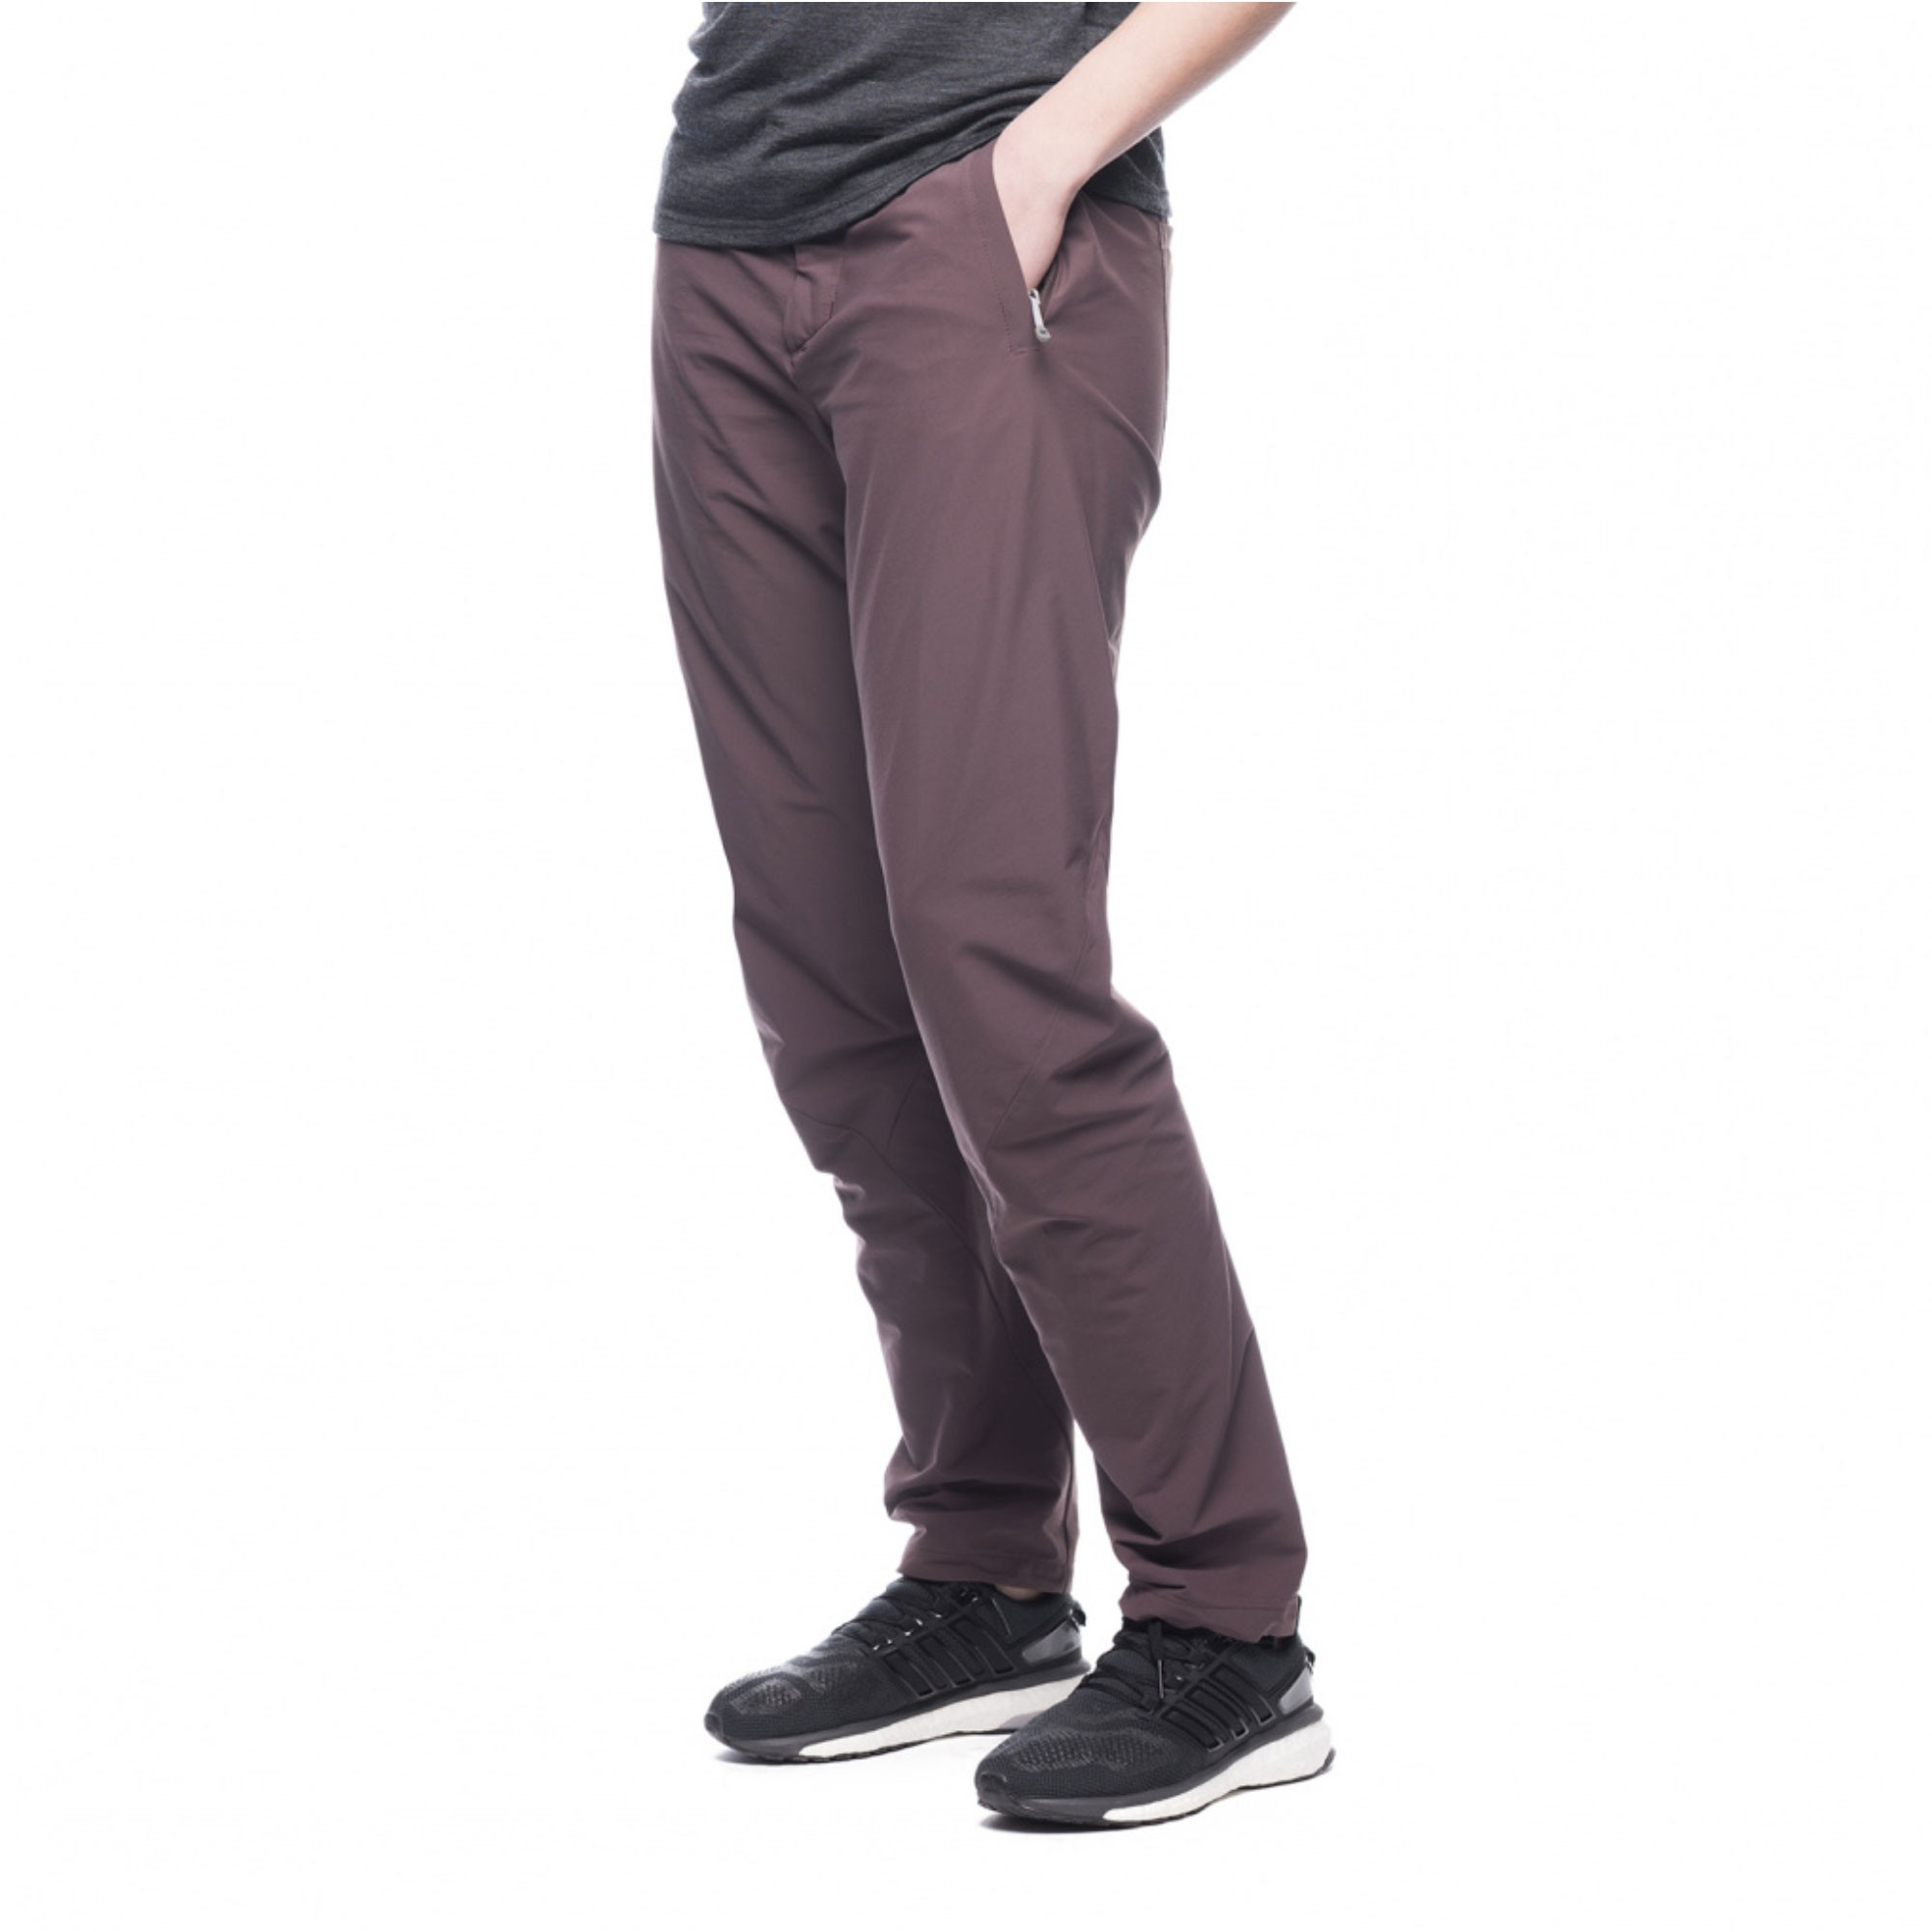 HOUDINI - Women's Liquid Rock Softshell Pants